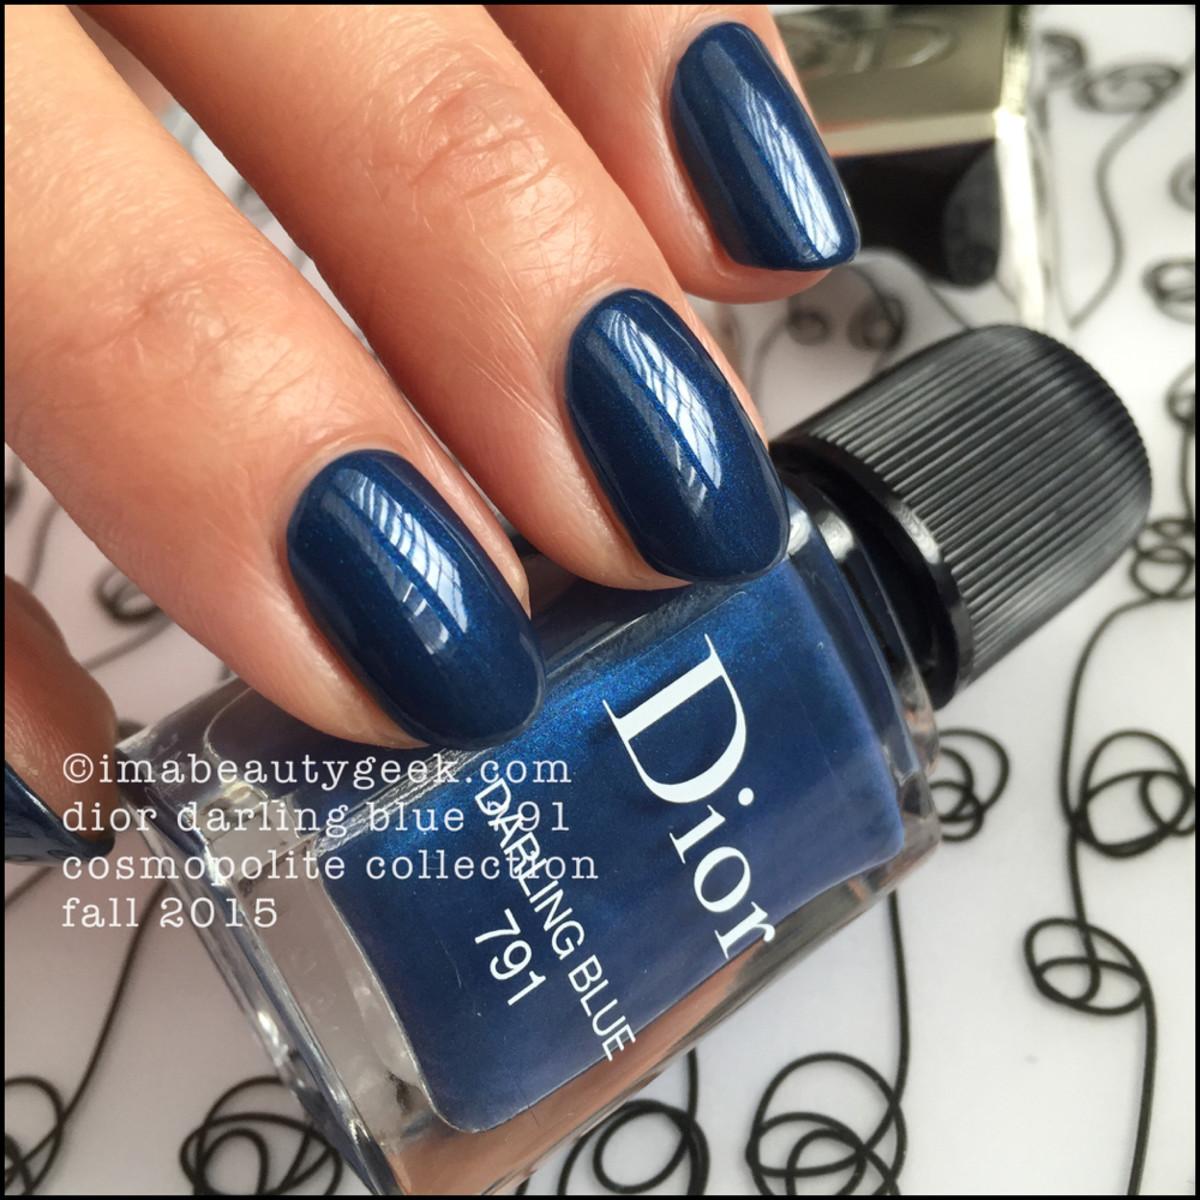 Dior Cosmopolite Fall 2015 Vernis_Dior Darling Blue Vernis Polish 791